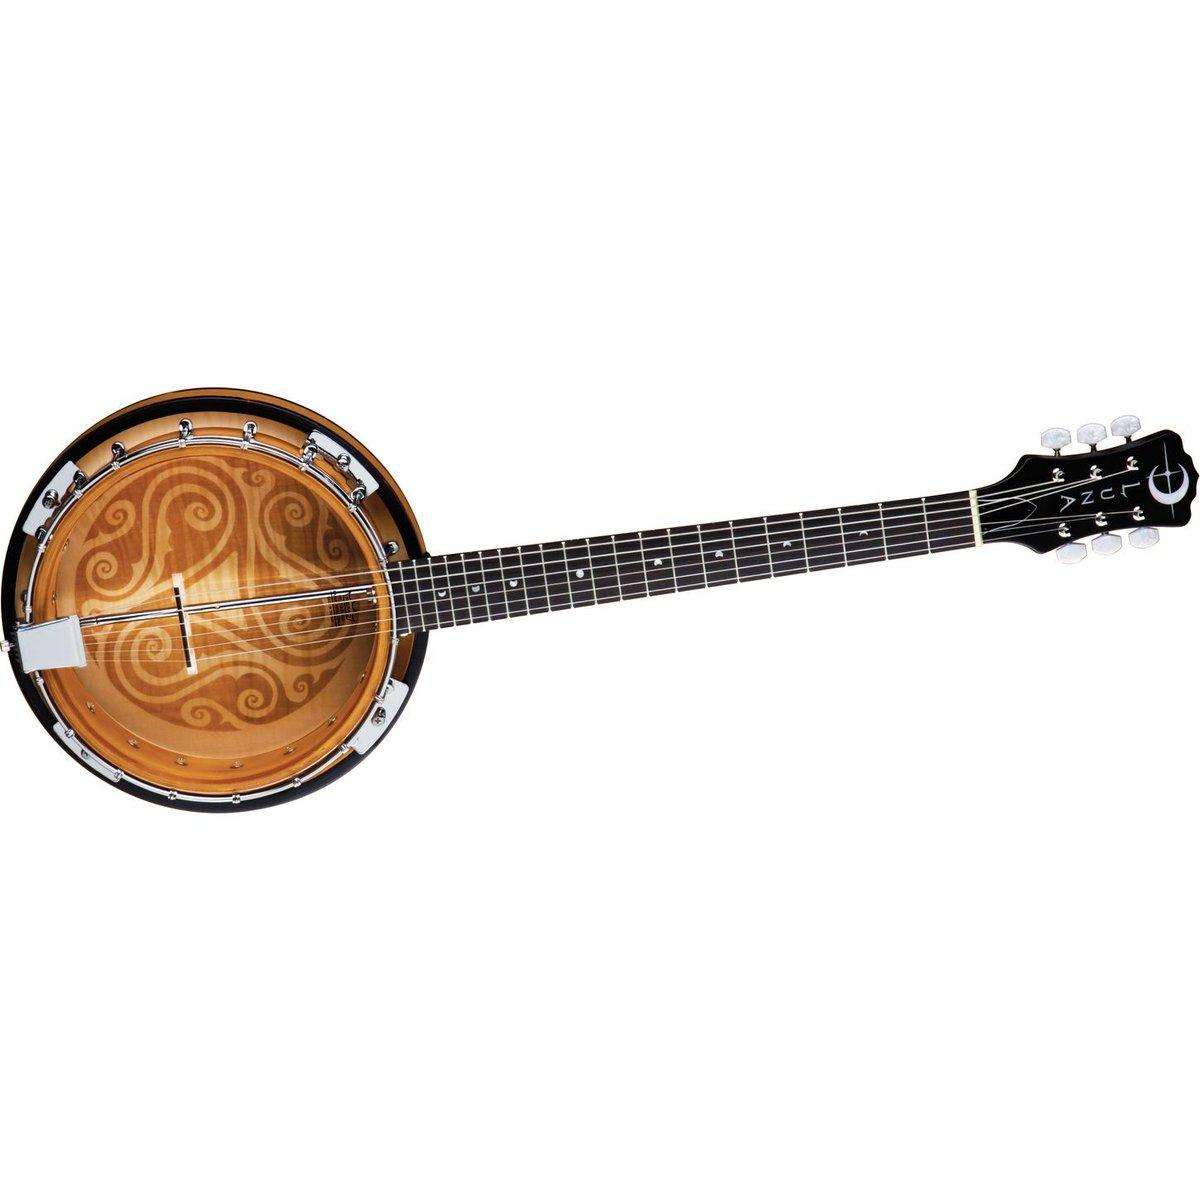 Luna Celtic 6-String Banjo  Shop now at http://bit.ly/LunaCelt6  #banjo #bluegrass #countrycurrent #fiddle #mandolin #celticgrass #irishmusic #bluegrassunderground #Americana #folk #country #jamband #celtic #JohnLennon #SundayMotivationpic.twitter.com/yQLDmrhRmx